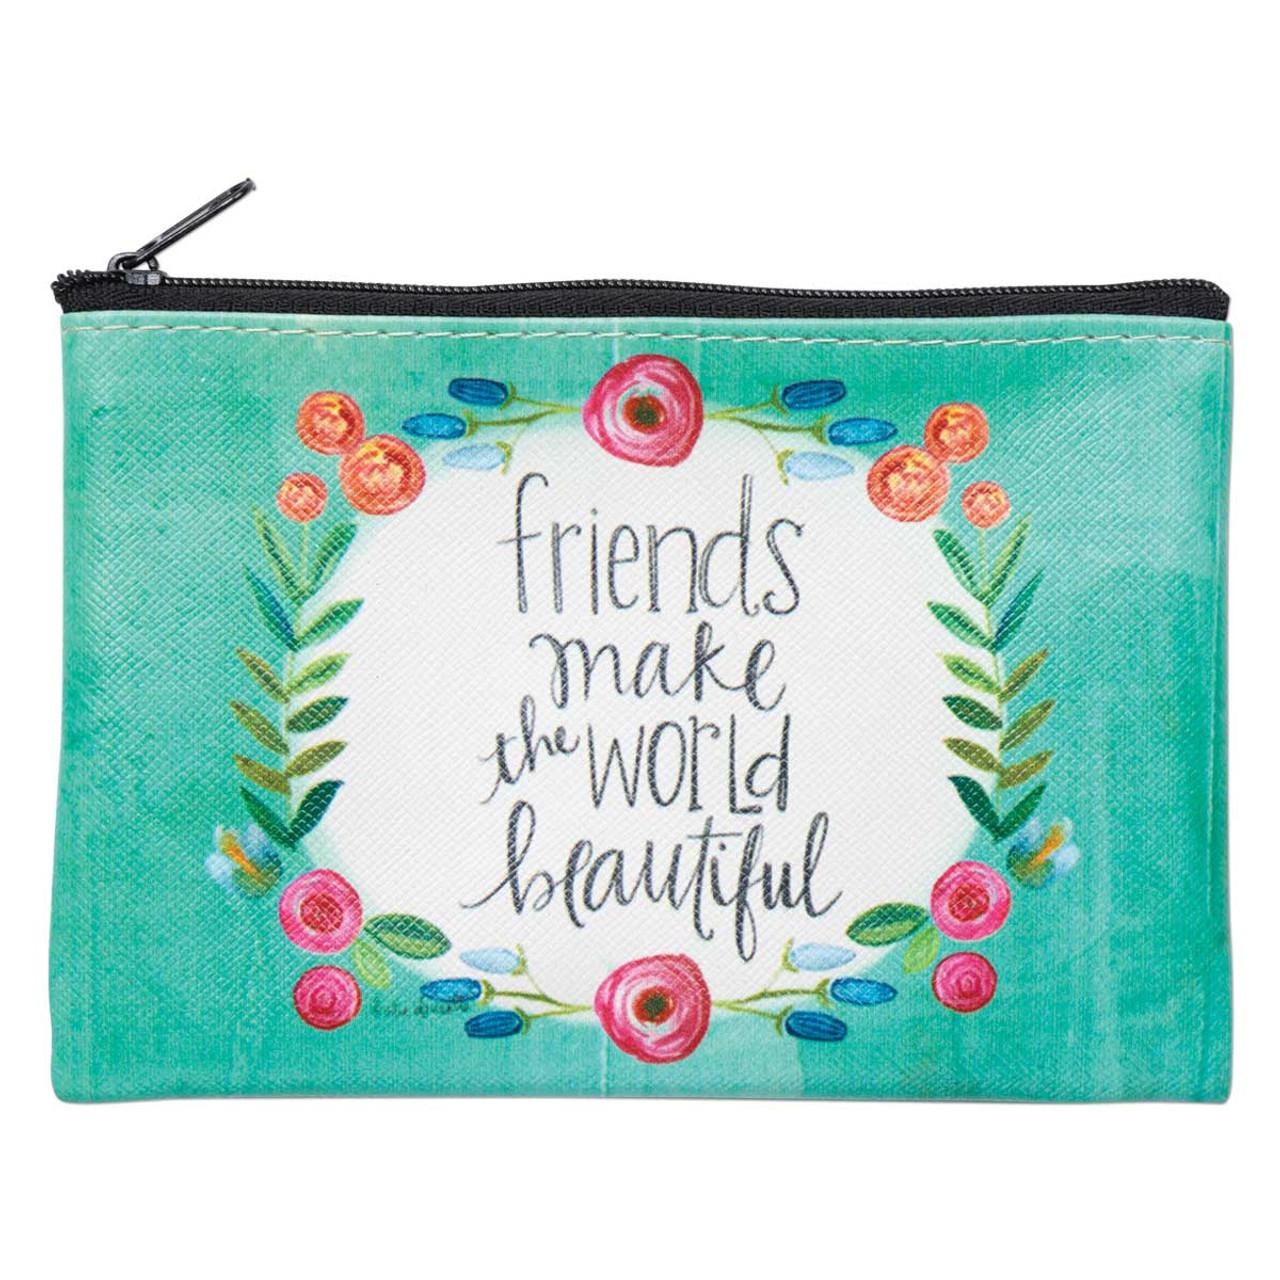 friends make the world beautiful zippered coin purse